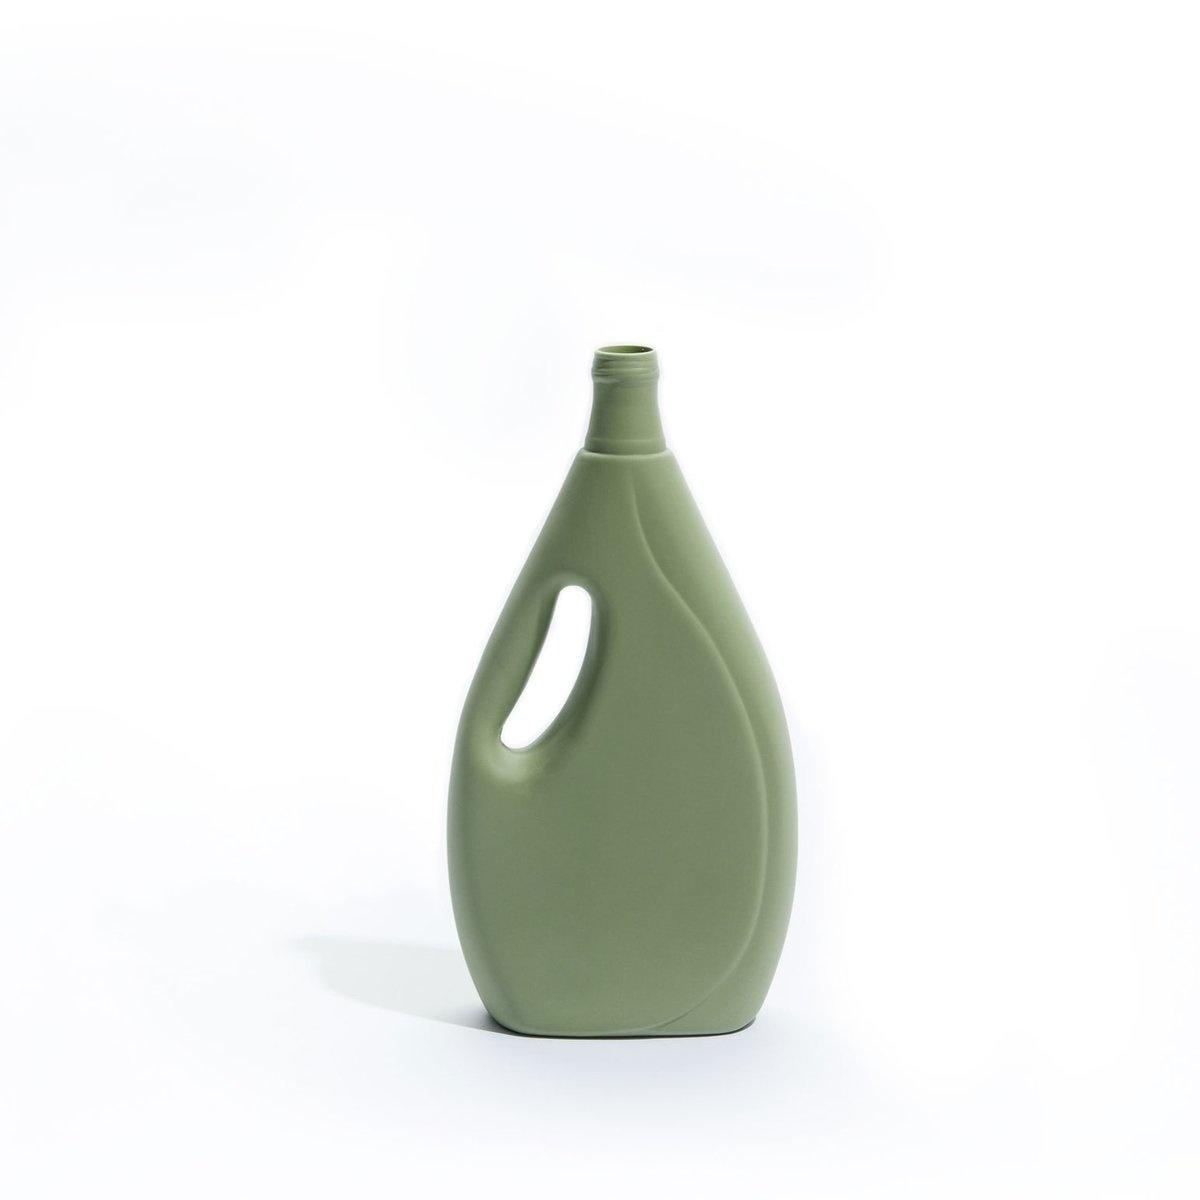 Laundry Detergent Bottle Vase-1